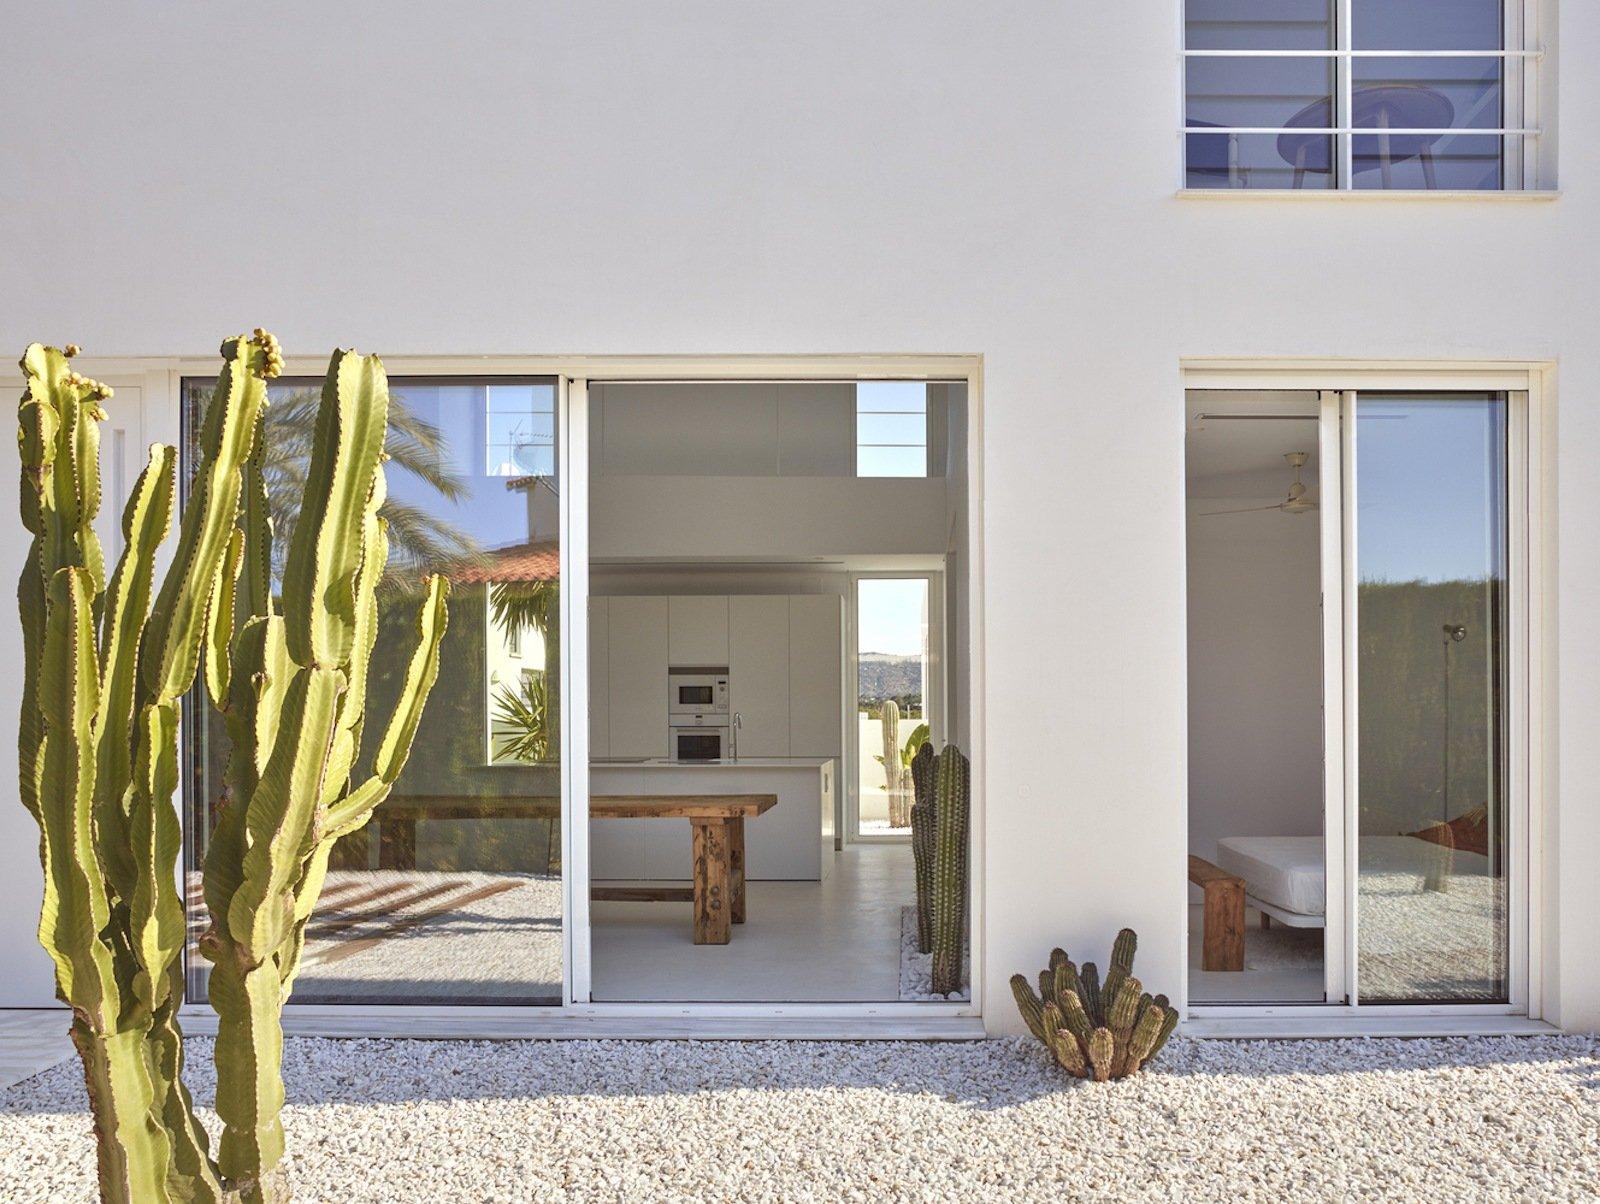 IGNANT-Architecture-Carles-Faus-Arquitectura-Carmen-House-015